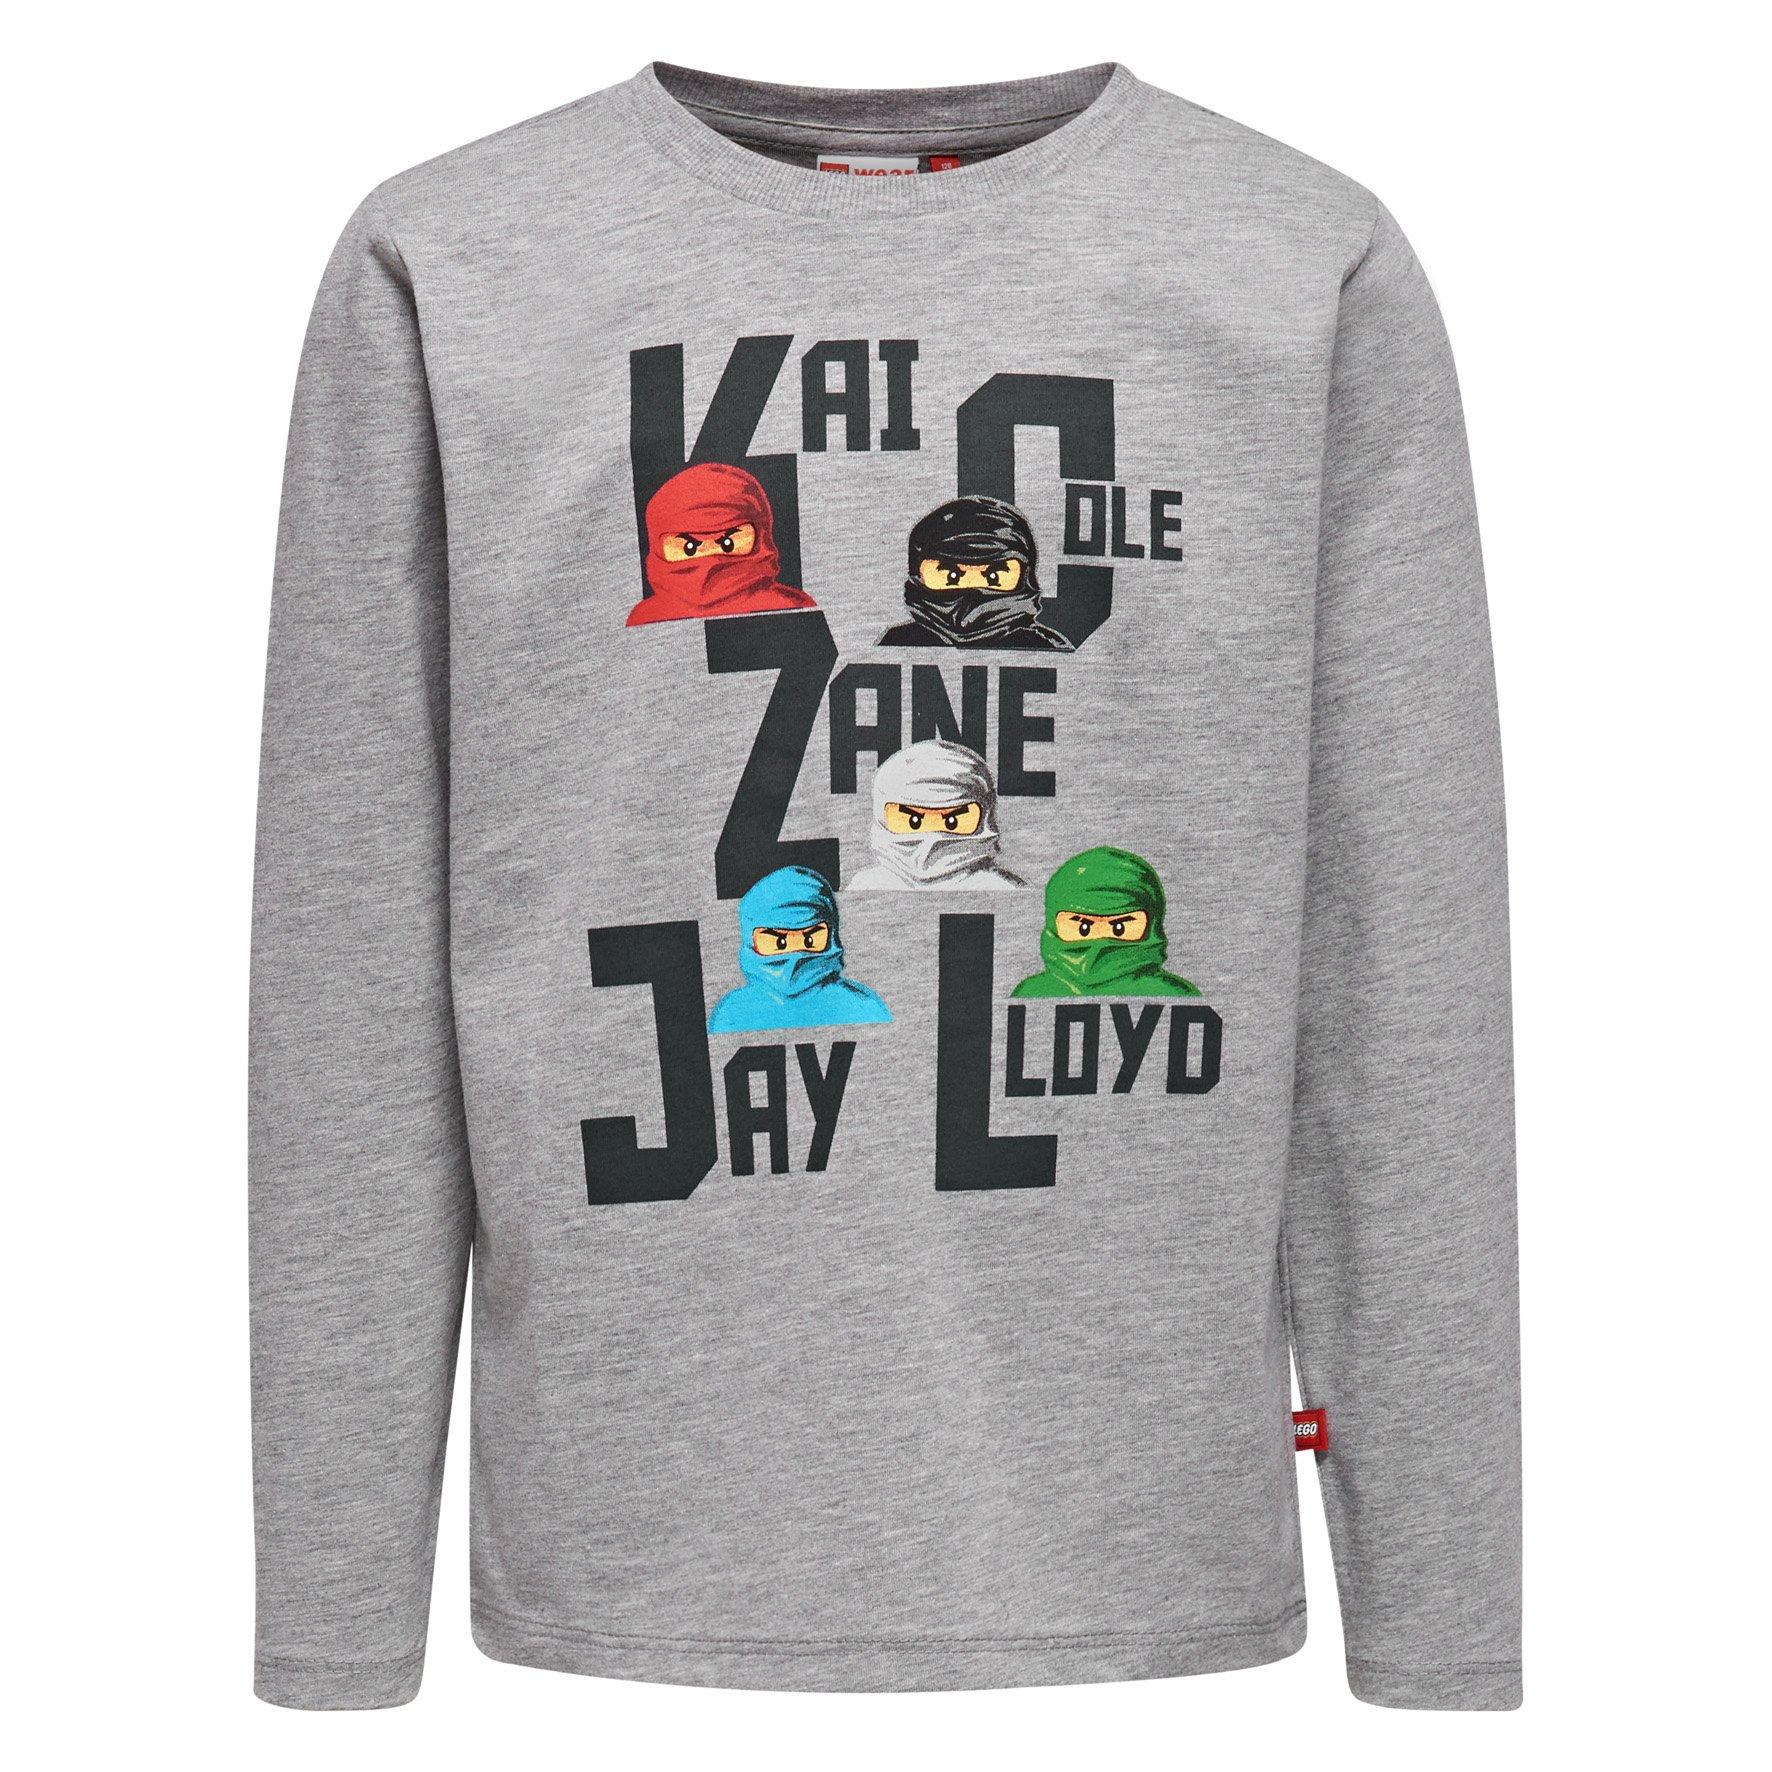 buy lego wear  ninjago tshirt ls  thomas 108